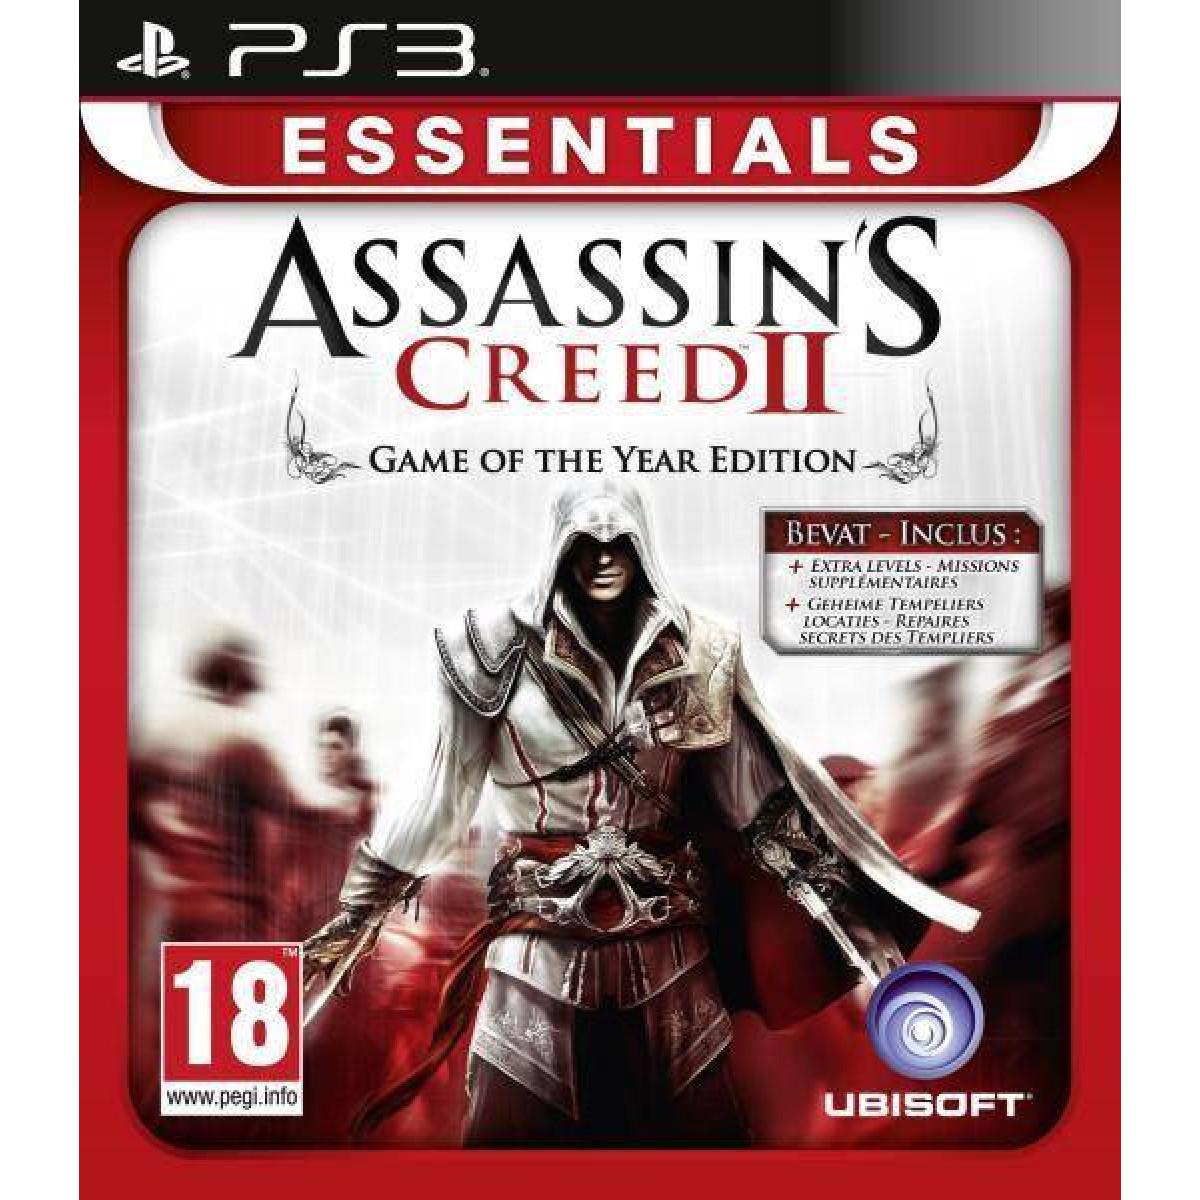 Assassin's Creed II (Essentials)